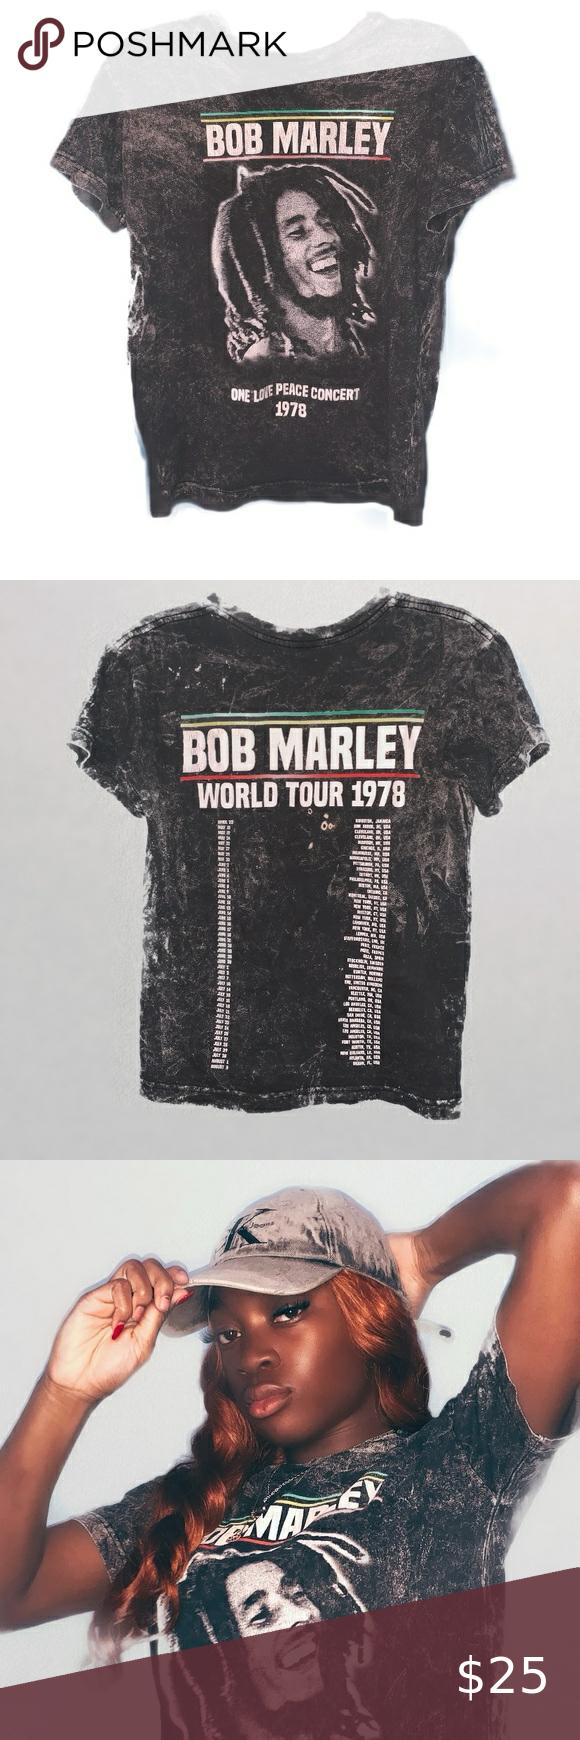 Bob Marley World Tour T Shirt In 2020 Tour T Shirts Bob Marley T Shirts Bob Marley